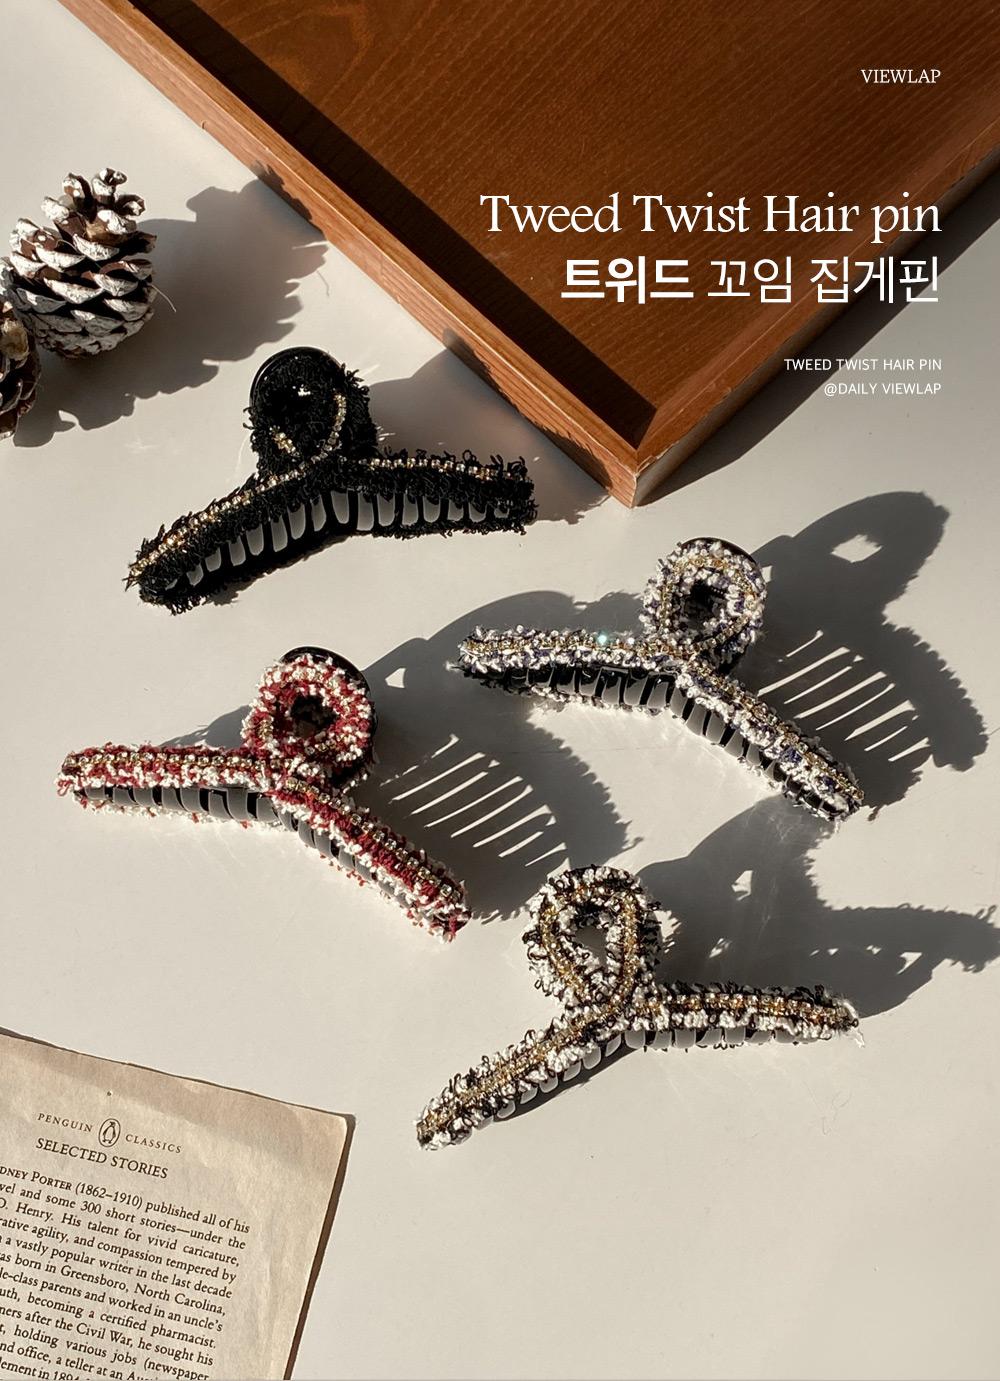 Tweed twist pin 4color